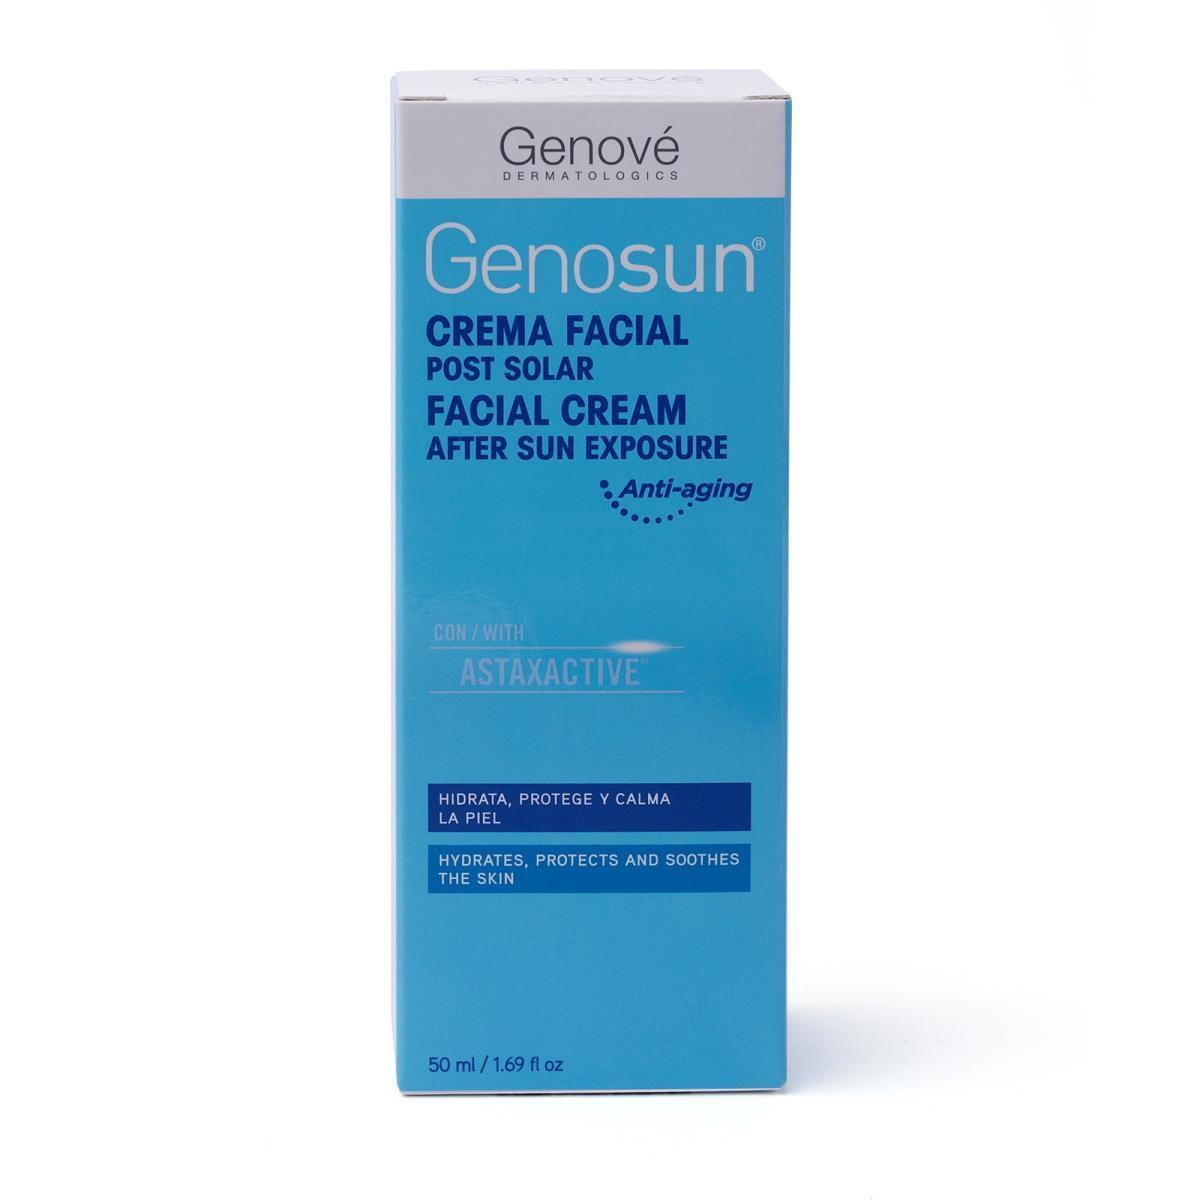 Genove Genosun Crema Facial Post Solar 50Ml